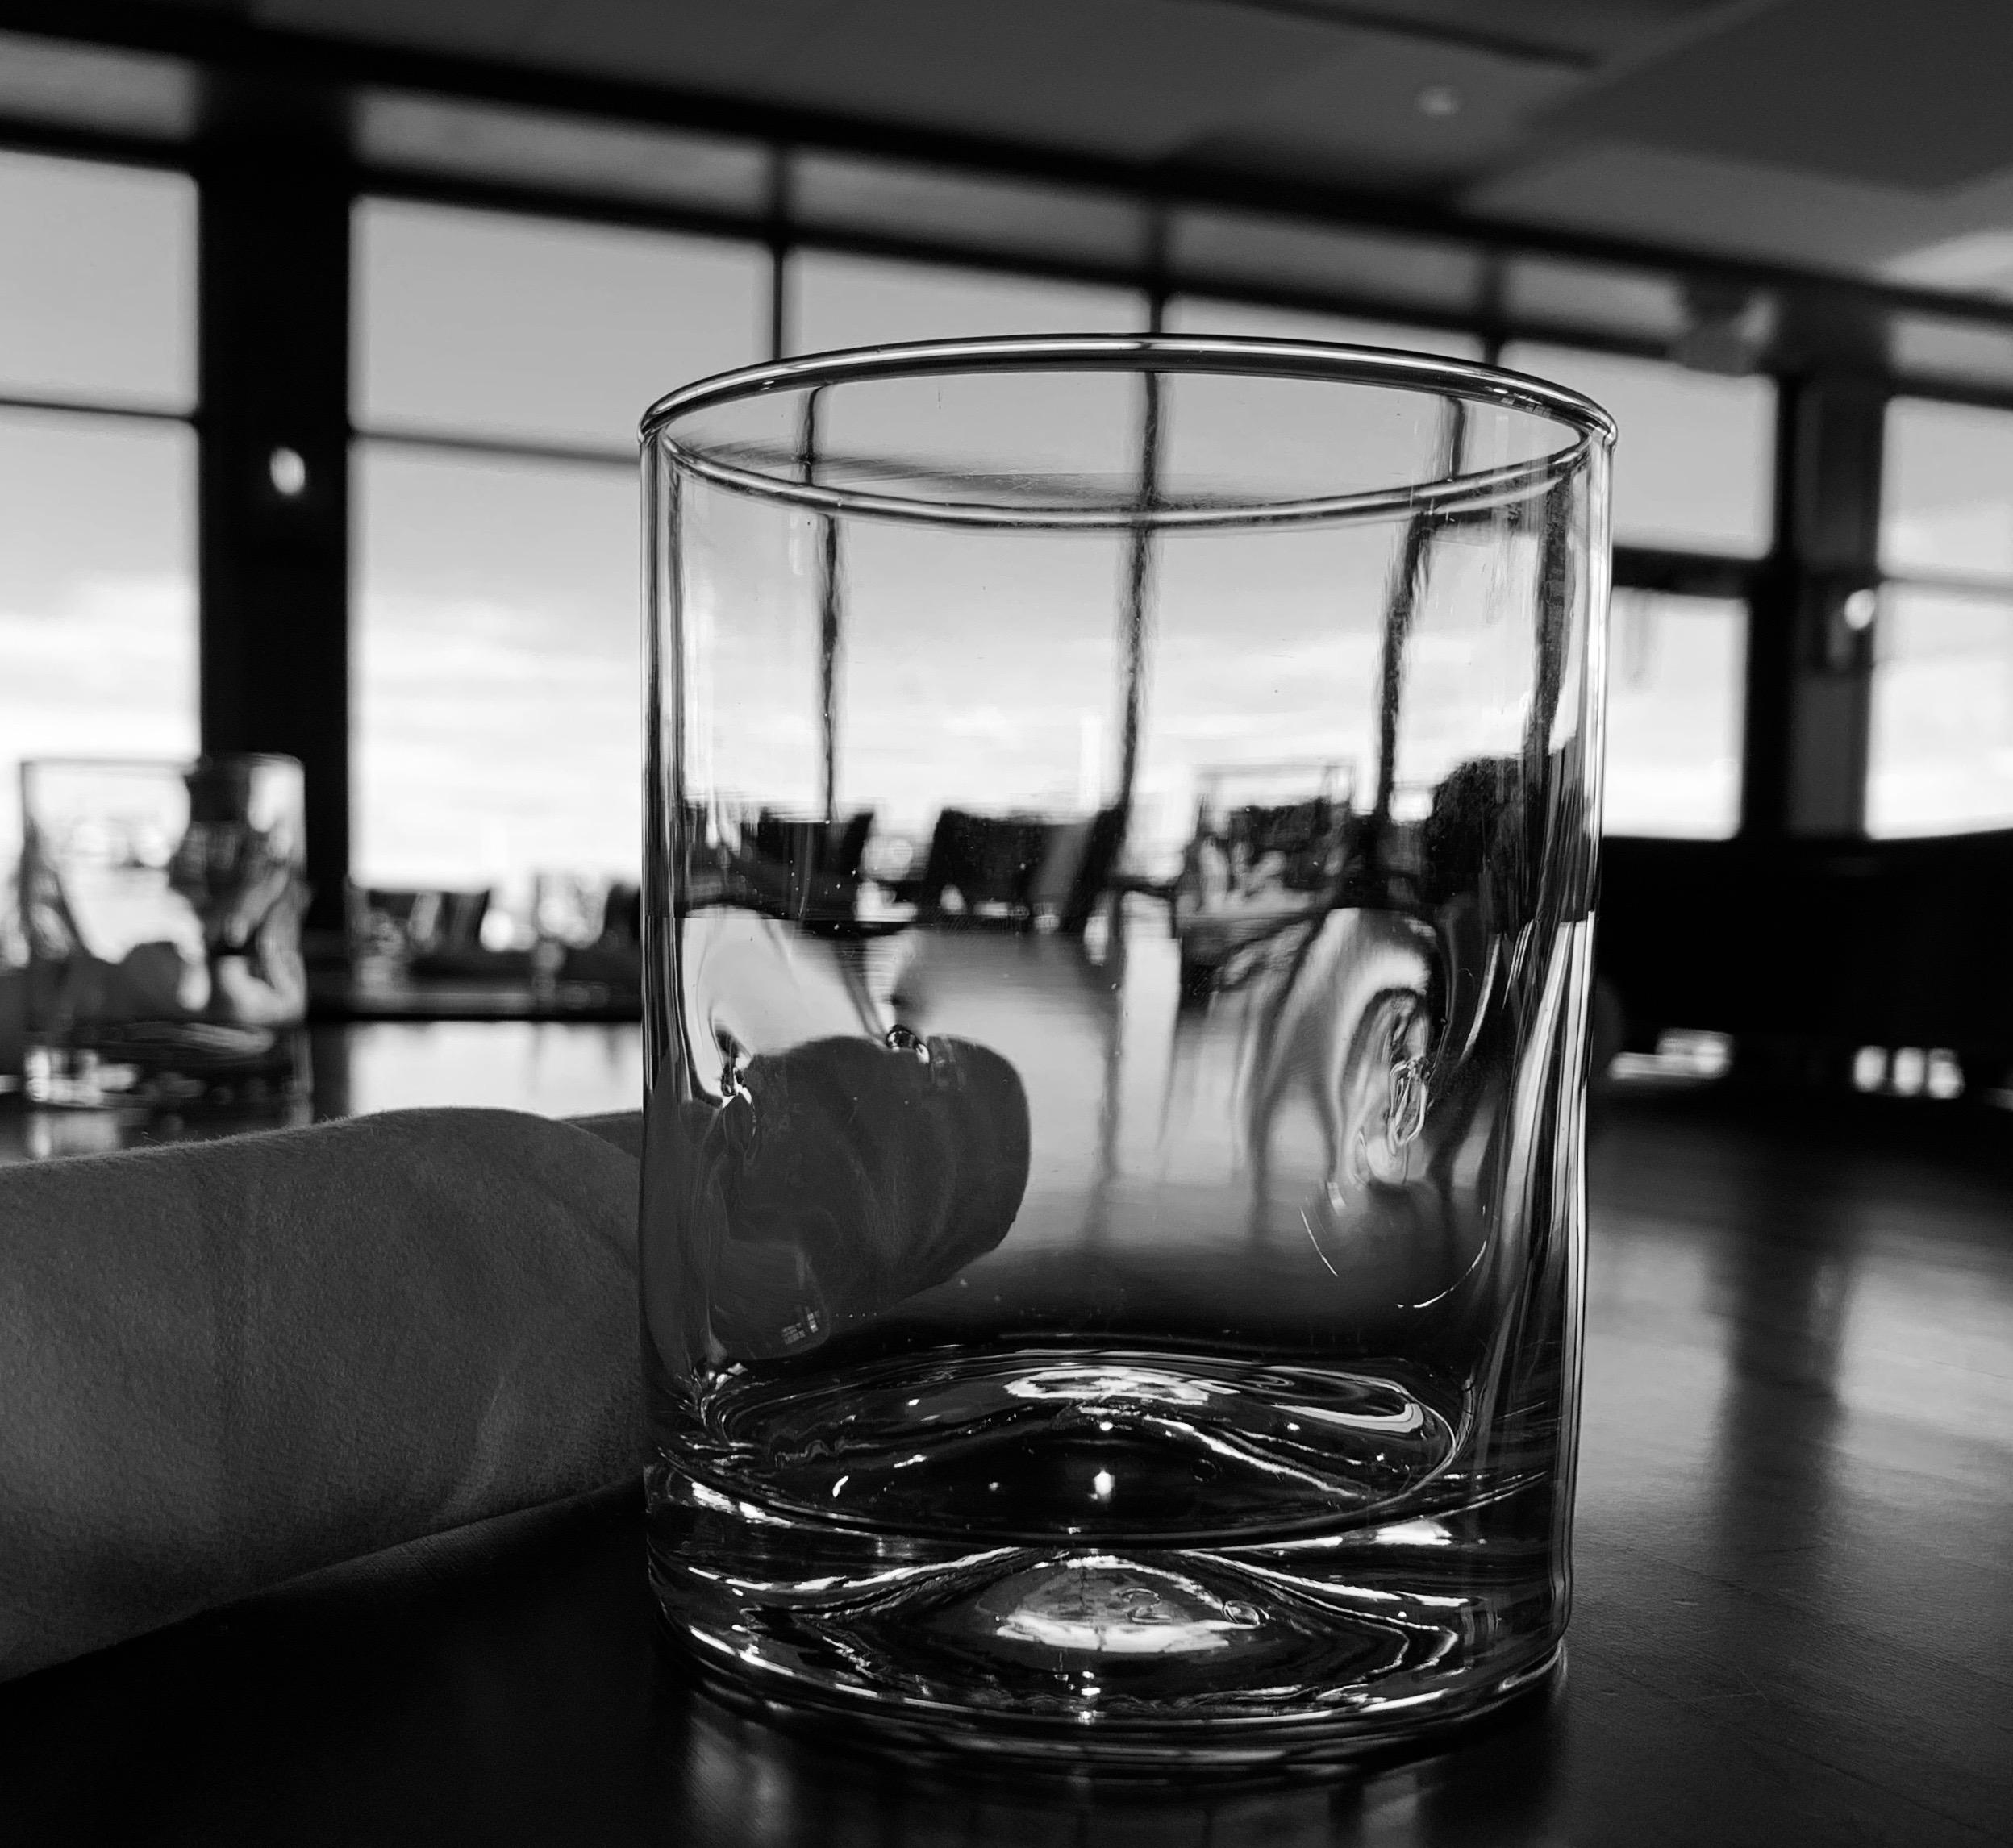 watercglass.JPG